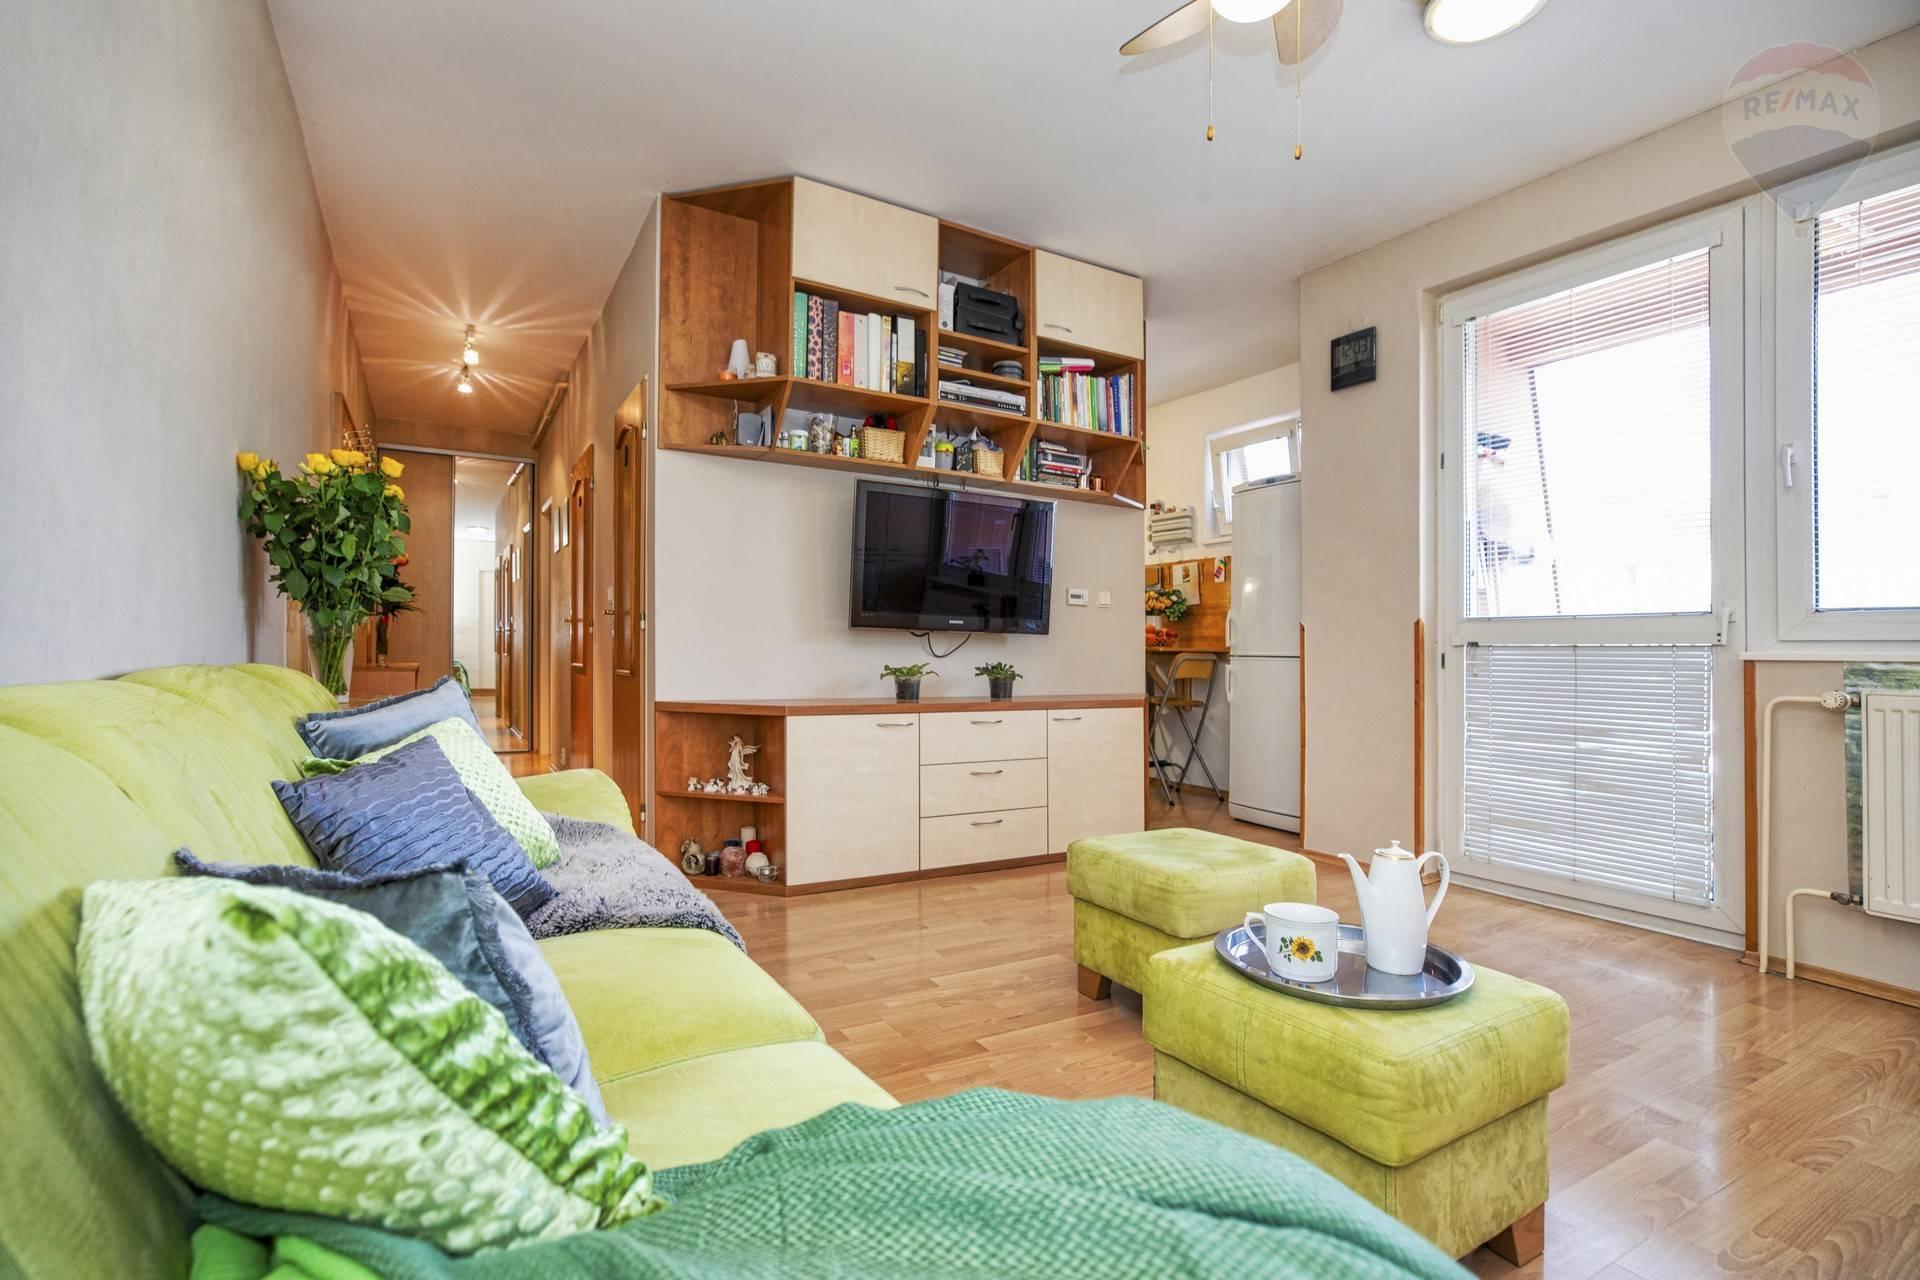 PREDAJ: 2 izbový byt, Latorická ulica, Podunajské Biskupice